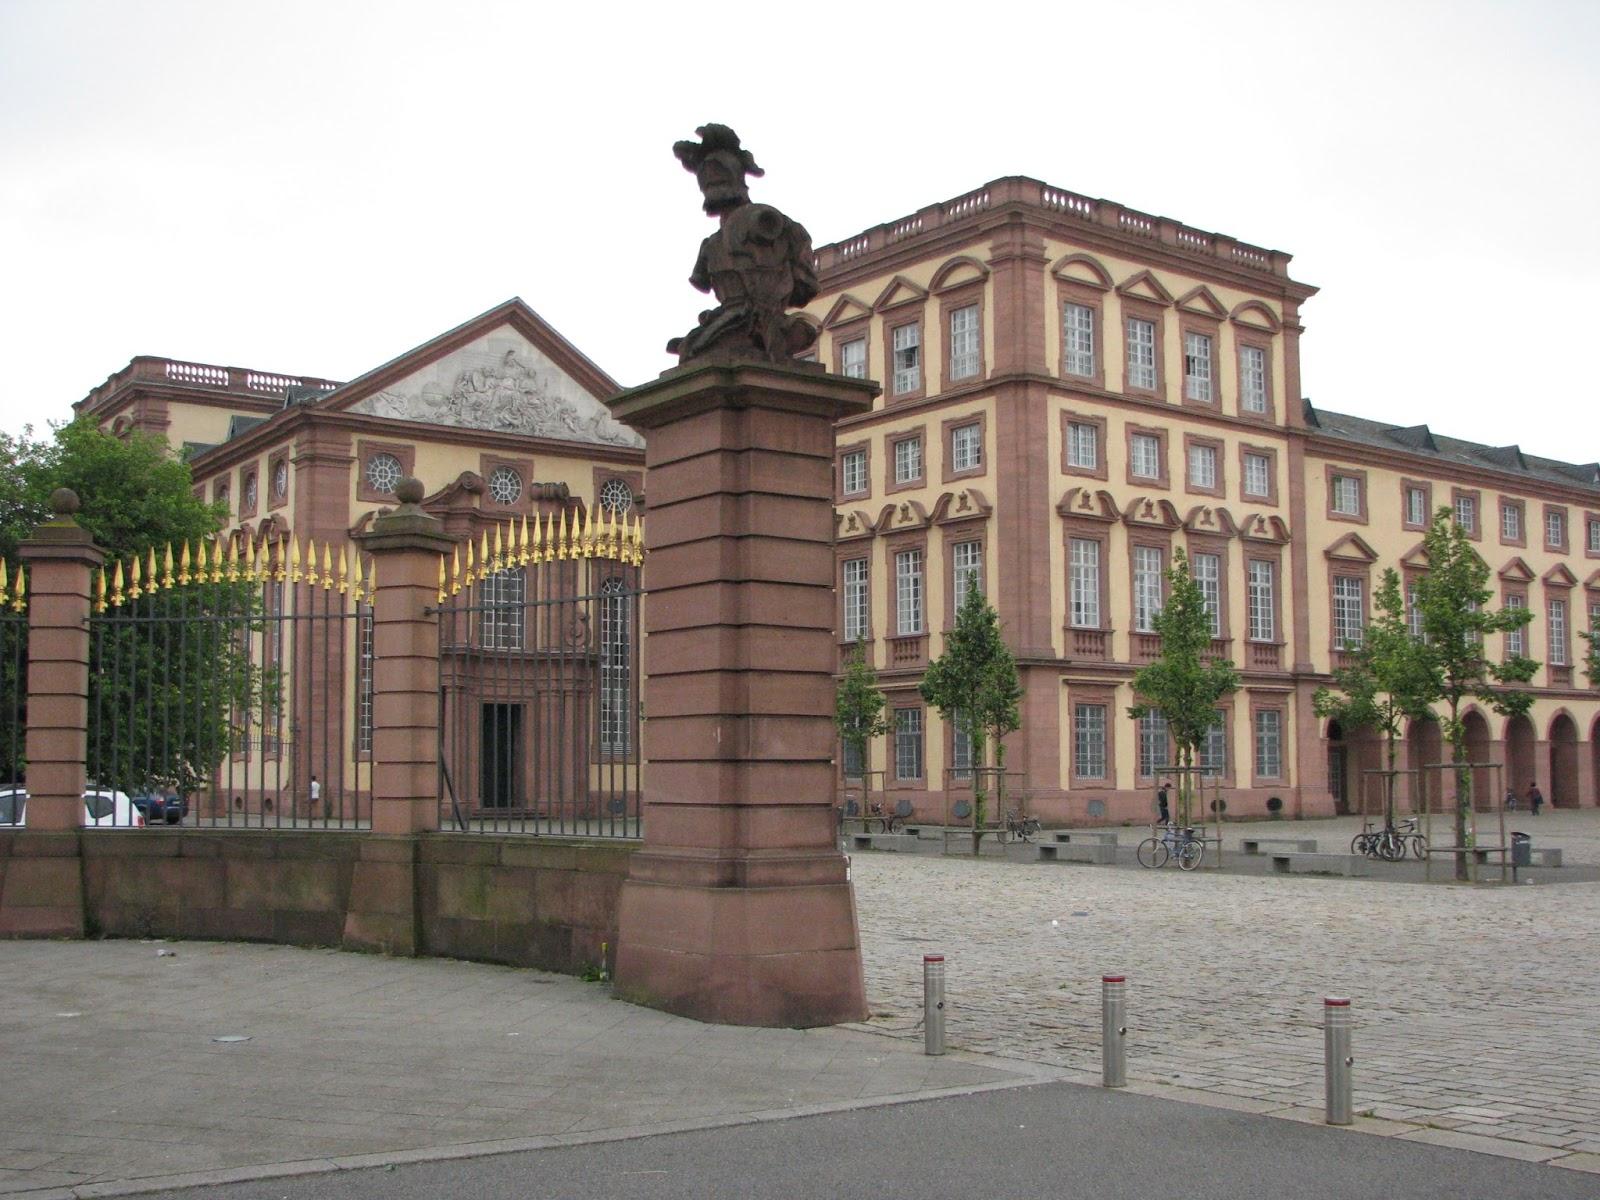 Mannheim flirt